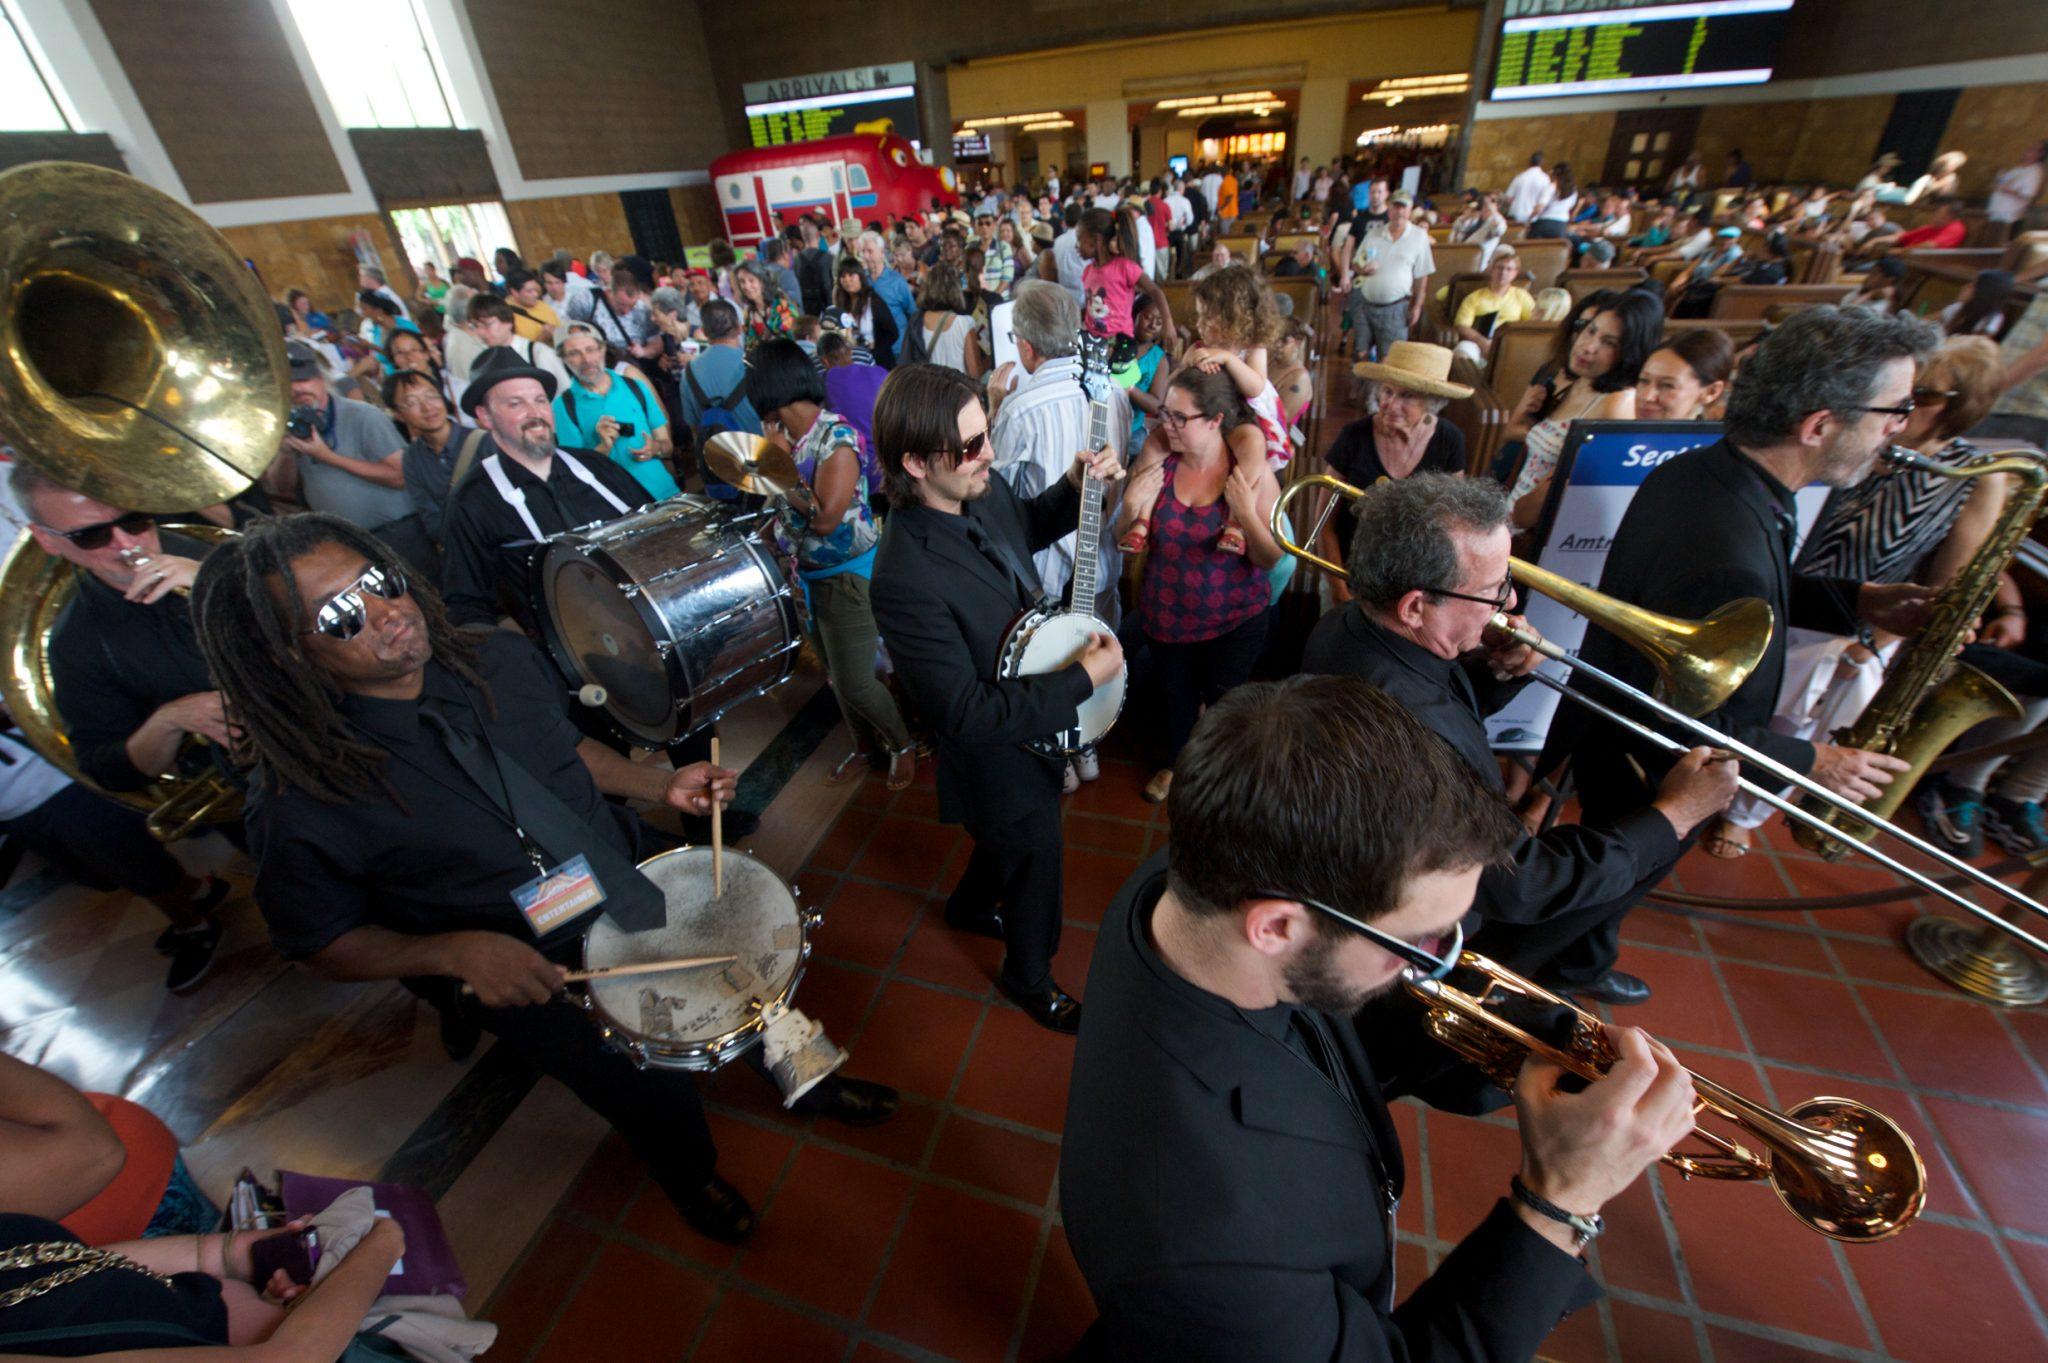 Metro Presents: Mudbug Brass - Union Station 2014